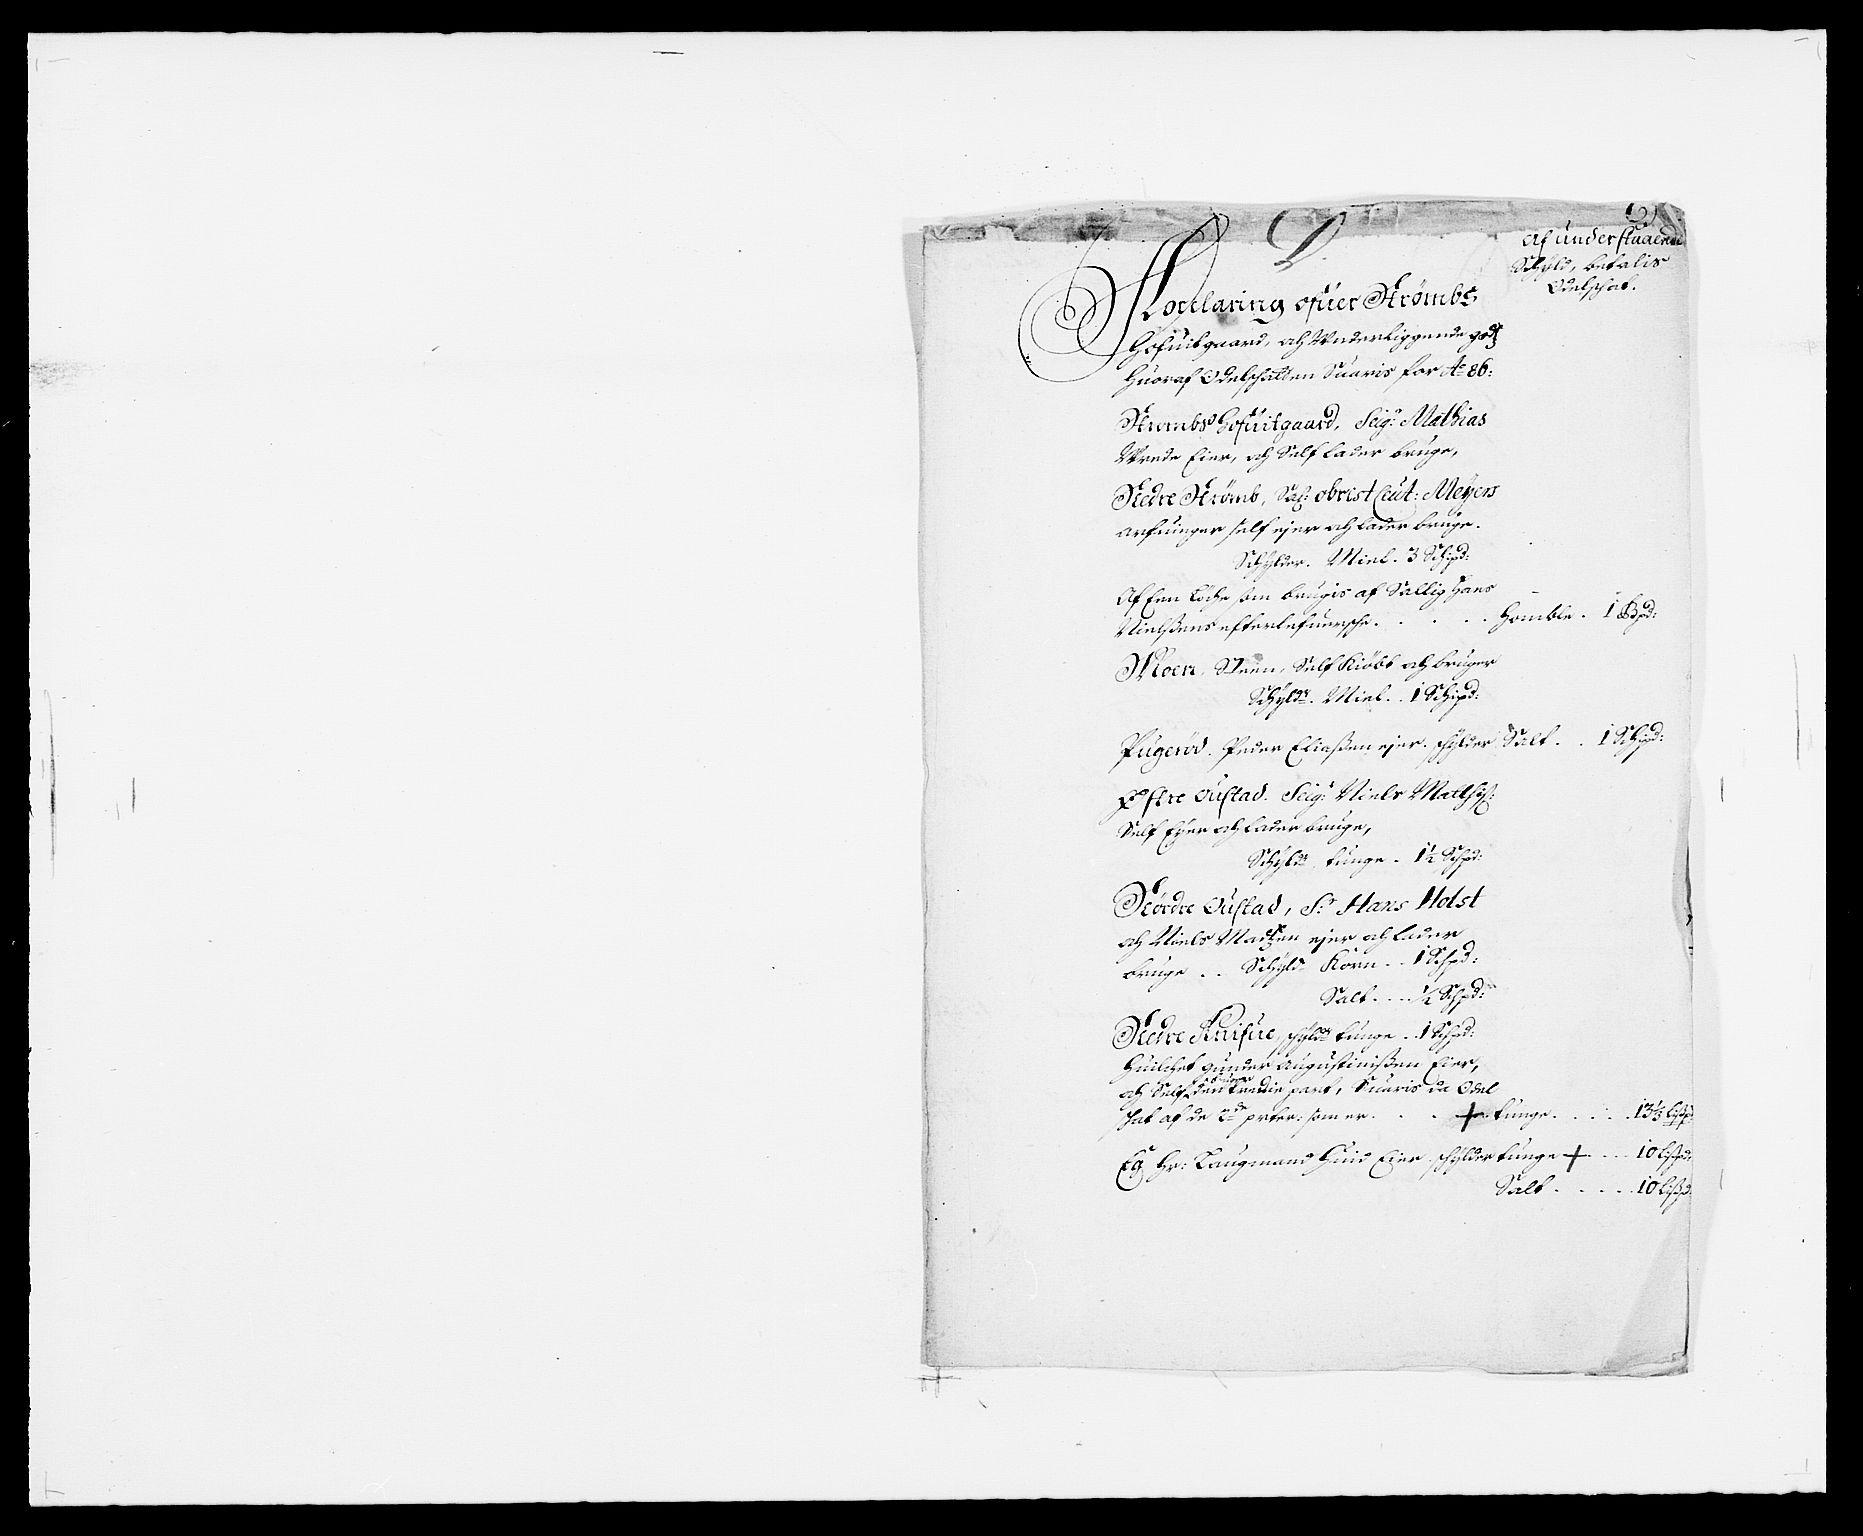 RA, Rentekammeret inntil 1814, Reviderte regnskaper, Fogderegnskap, R32/L1857: Fogderegnskap Jarlsberg grevskap, 1686-1690, s. 251